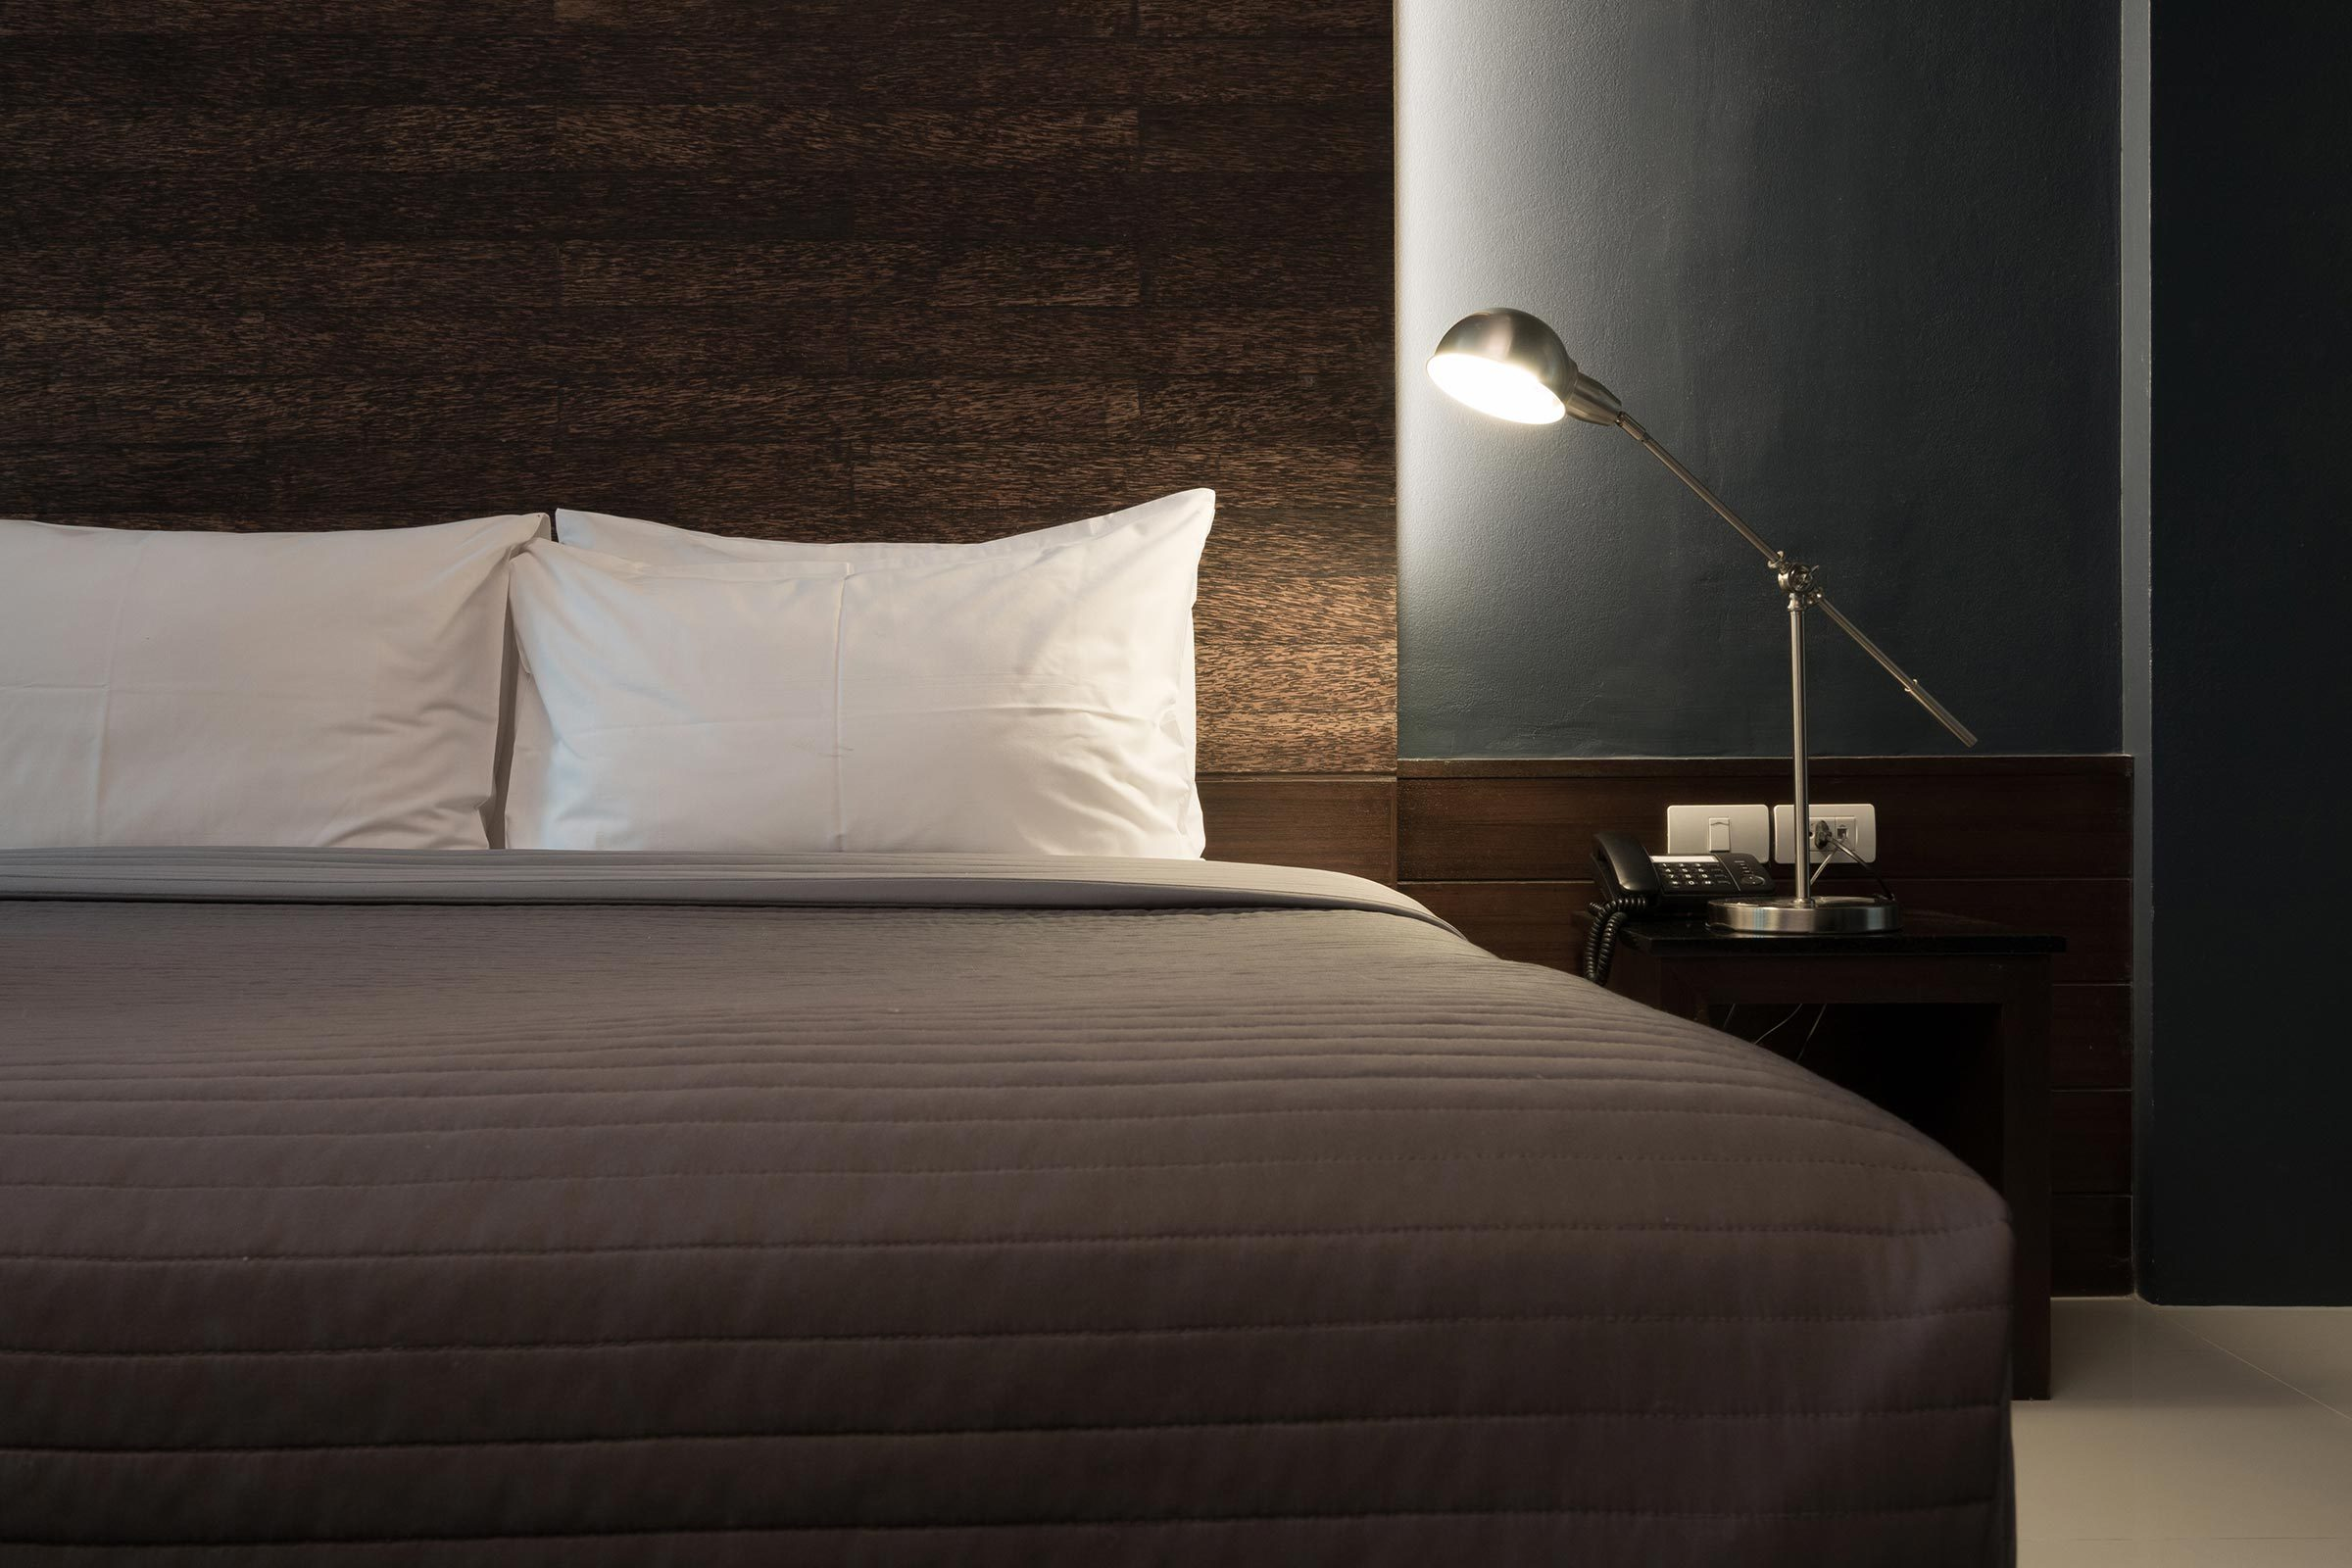 bed night light